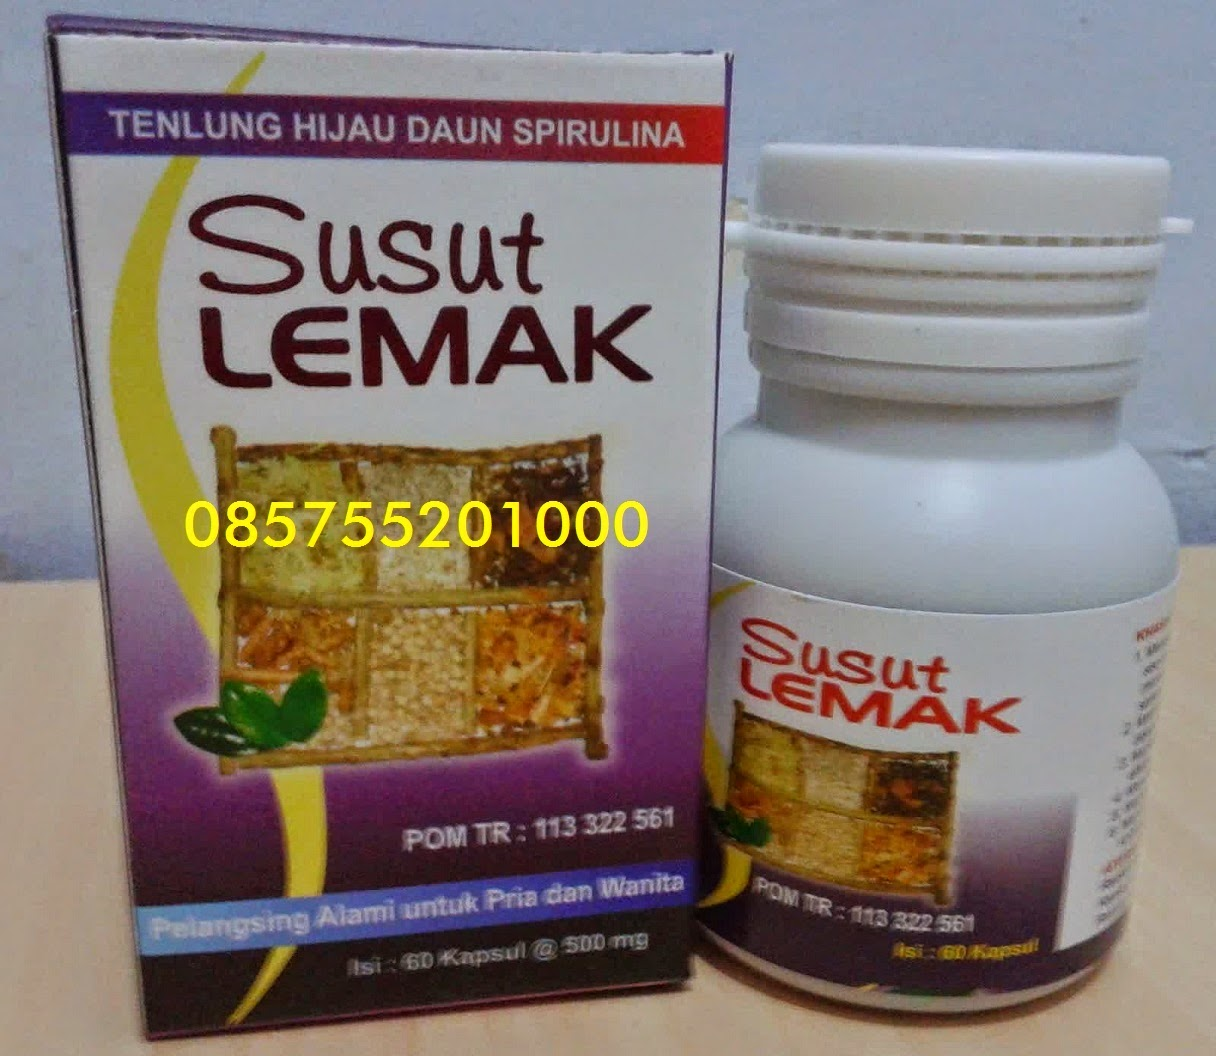 Madu Diet Penurun Berat Badan Surabaya 0857 5520 1000 Jual Ath Thoifah 350 Gr Original Untuk Menurunkan Di Dan Sidoarjo Asli